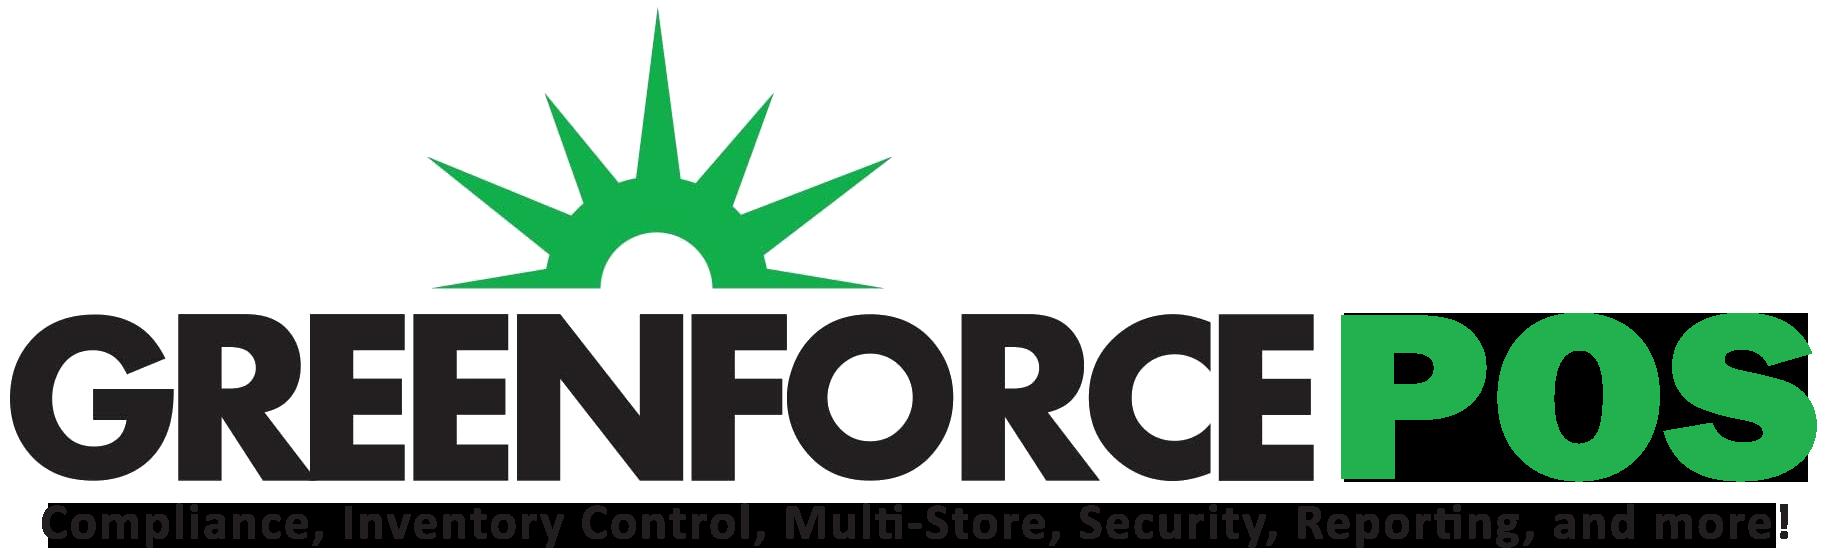 GreenForcePOS - Cannabis Dispensary POS